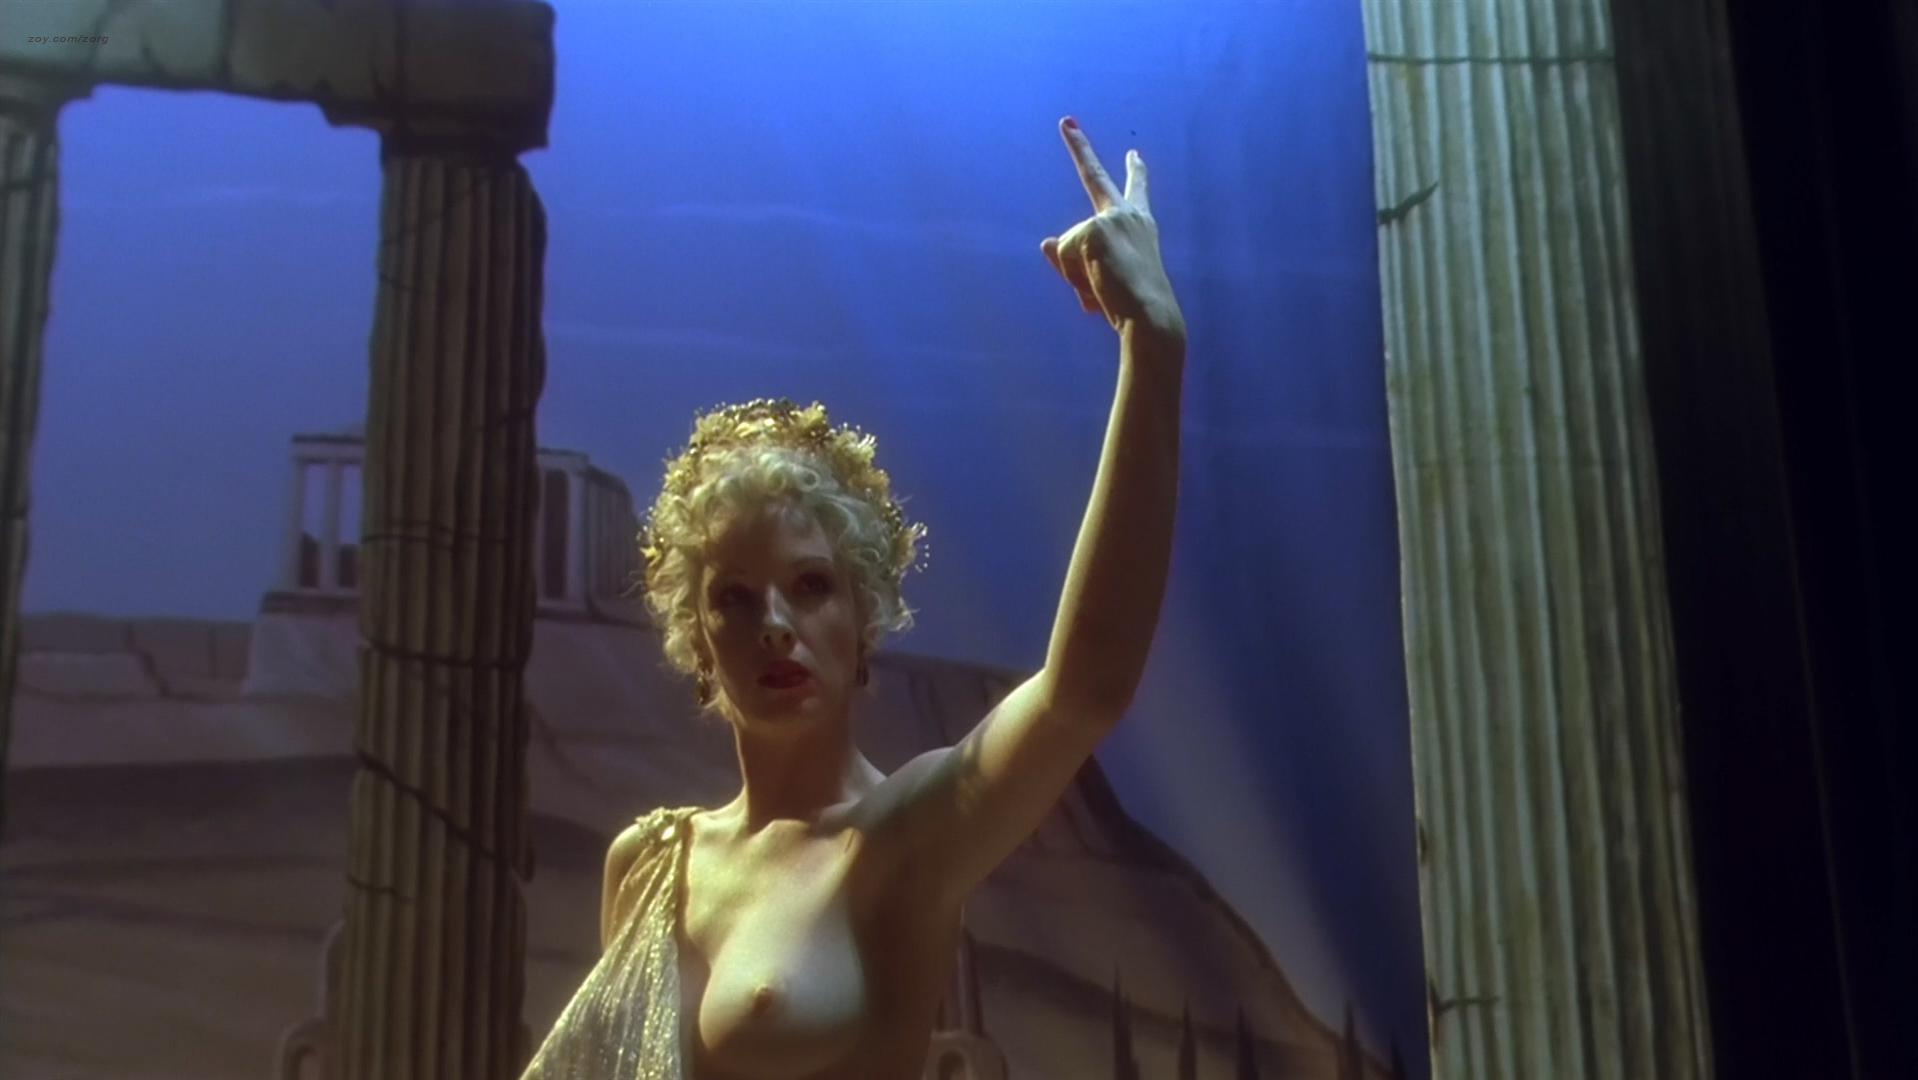 Kelly Reilly nude, Natalia Tena nude, Rosalind Halstead nude, Anna Brewster nude - Mrs Henderson Presents (2005)